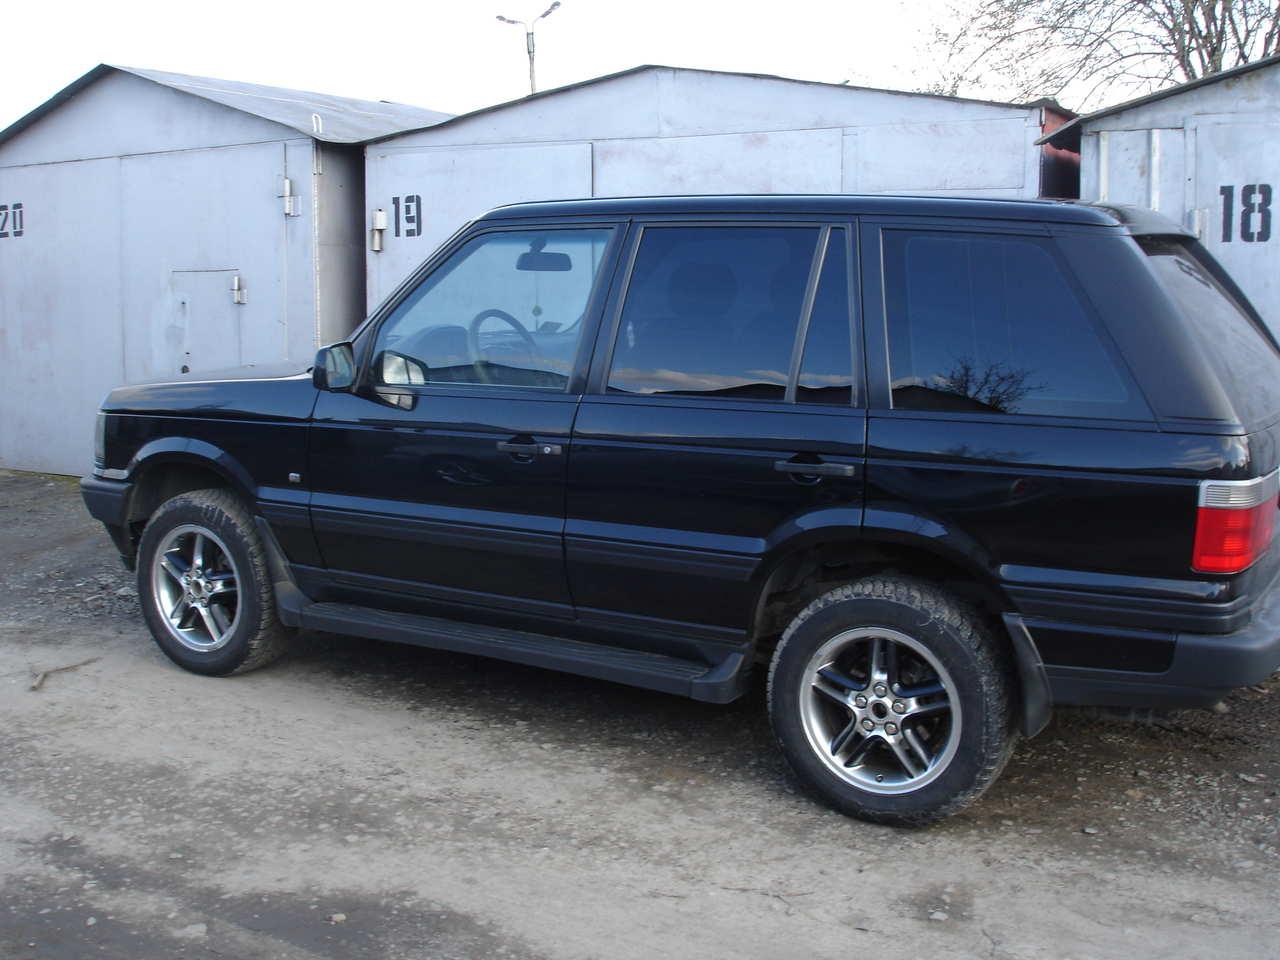 2000 Land Rover Range Rover Image 4